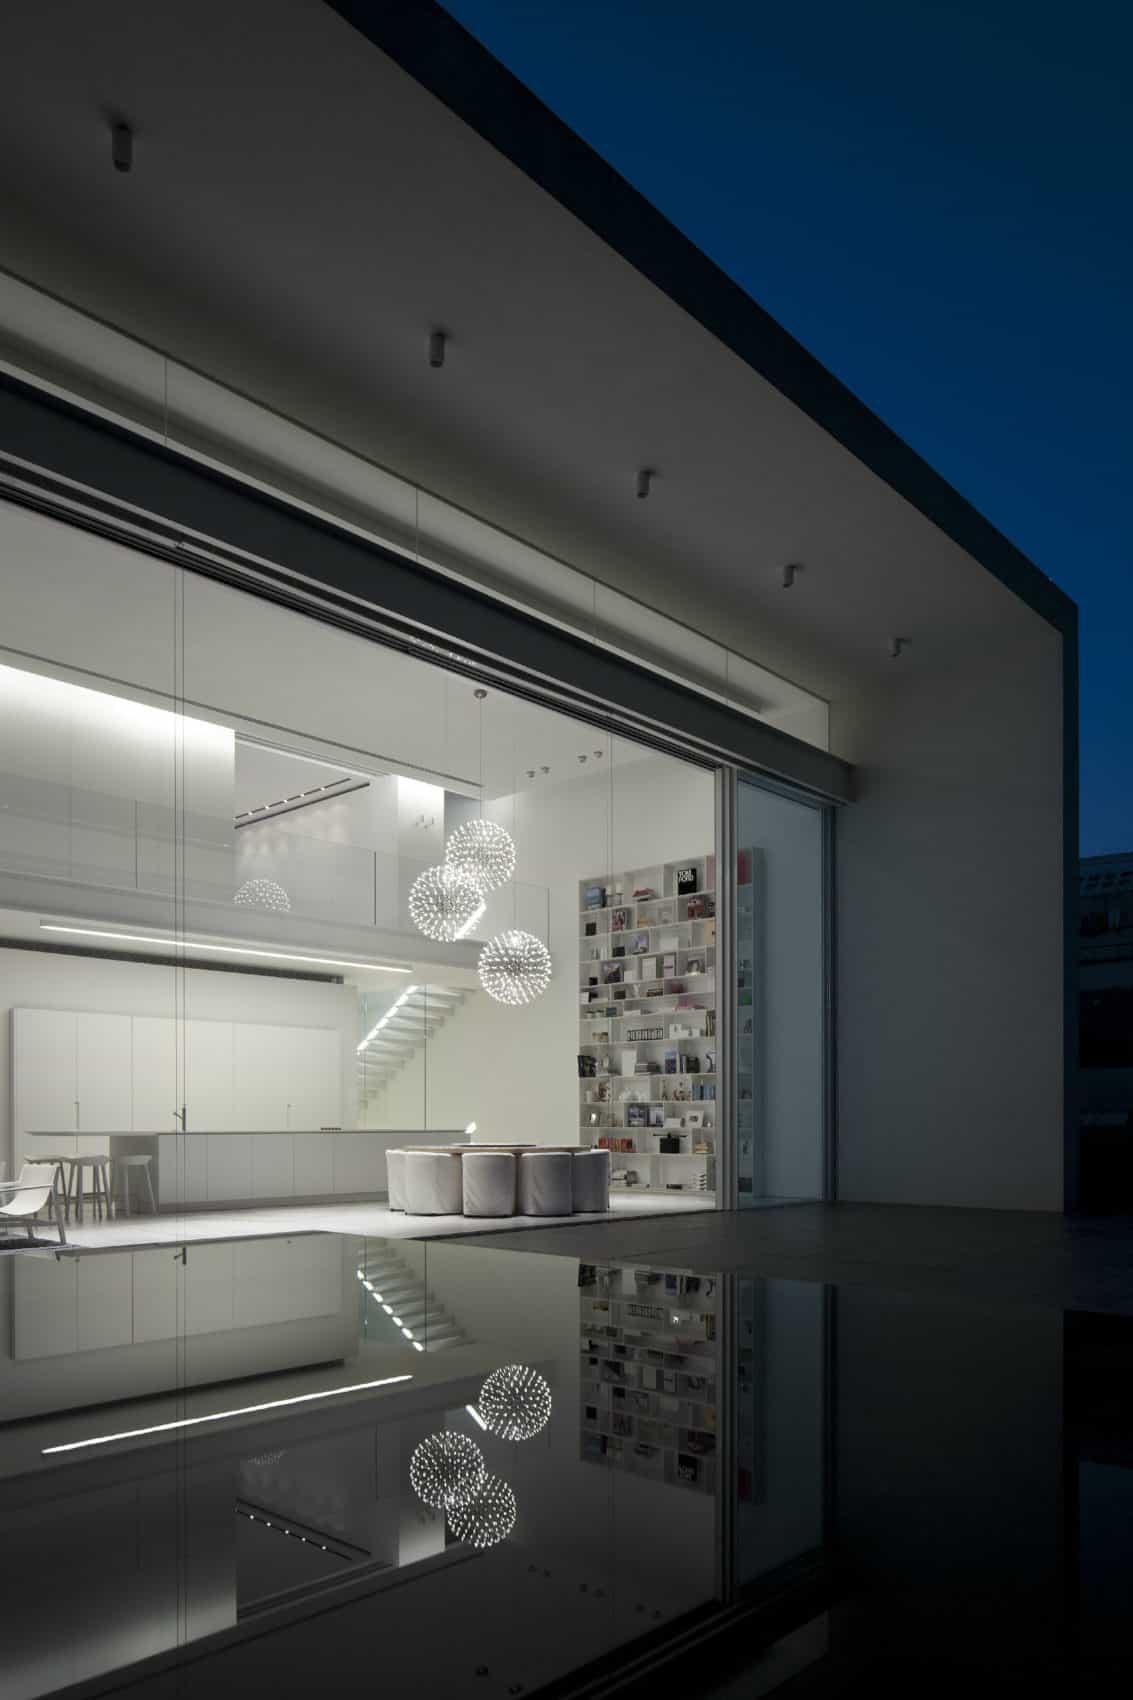 Ramat Hasharon House 13 by Pitsou Kedem Architects (25)